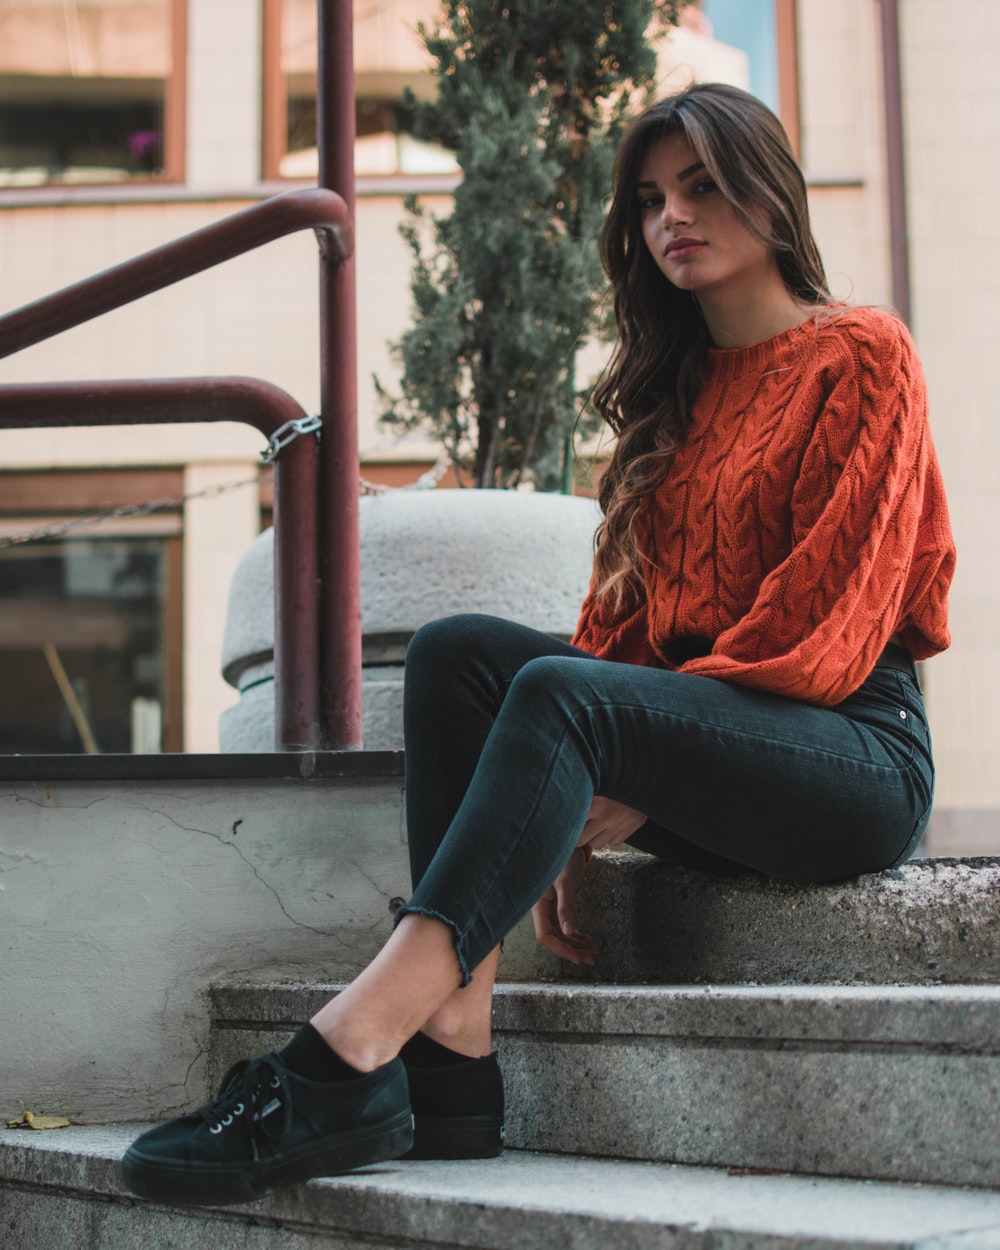 woman wearing orange crew-neck sweater sitting on the stair